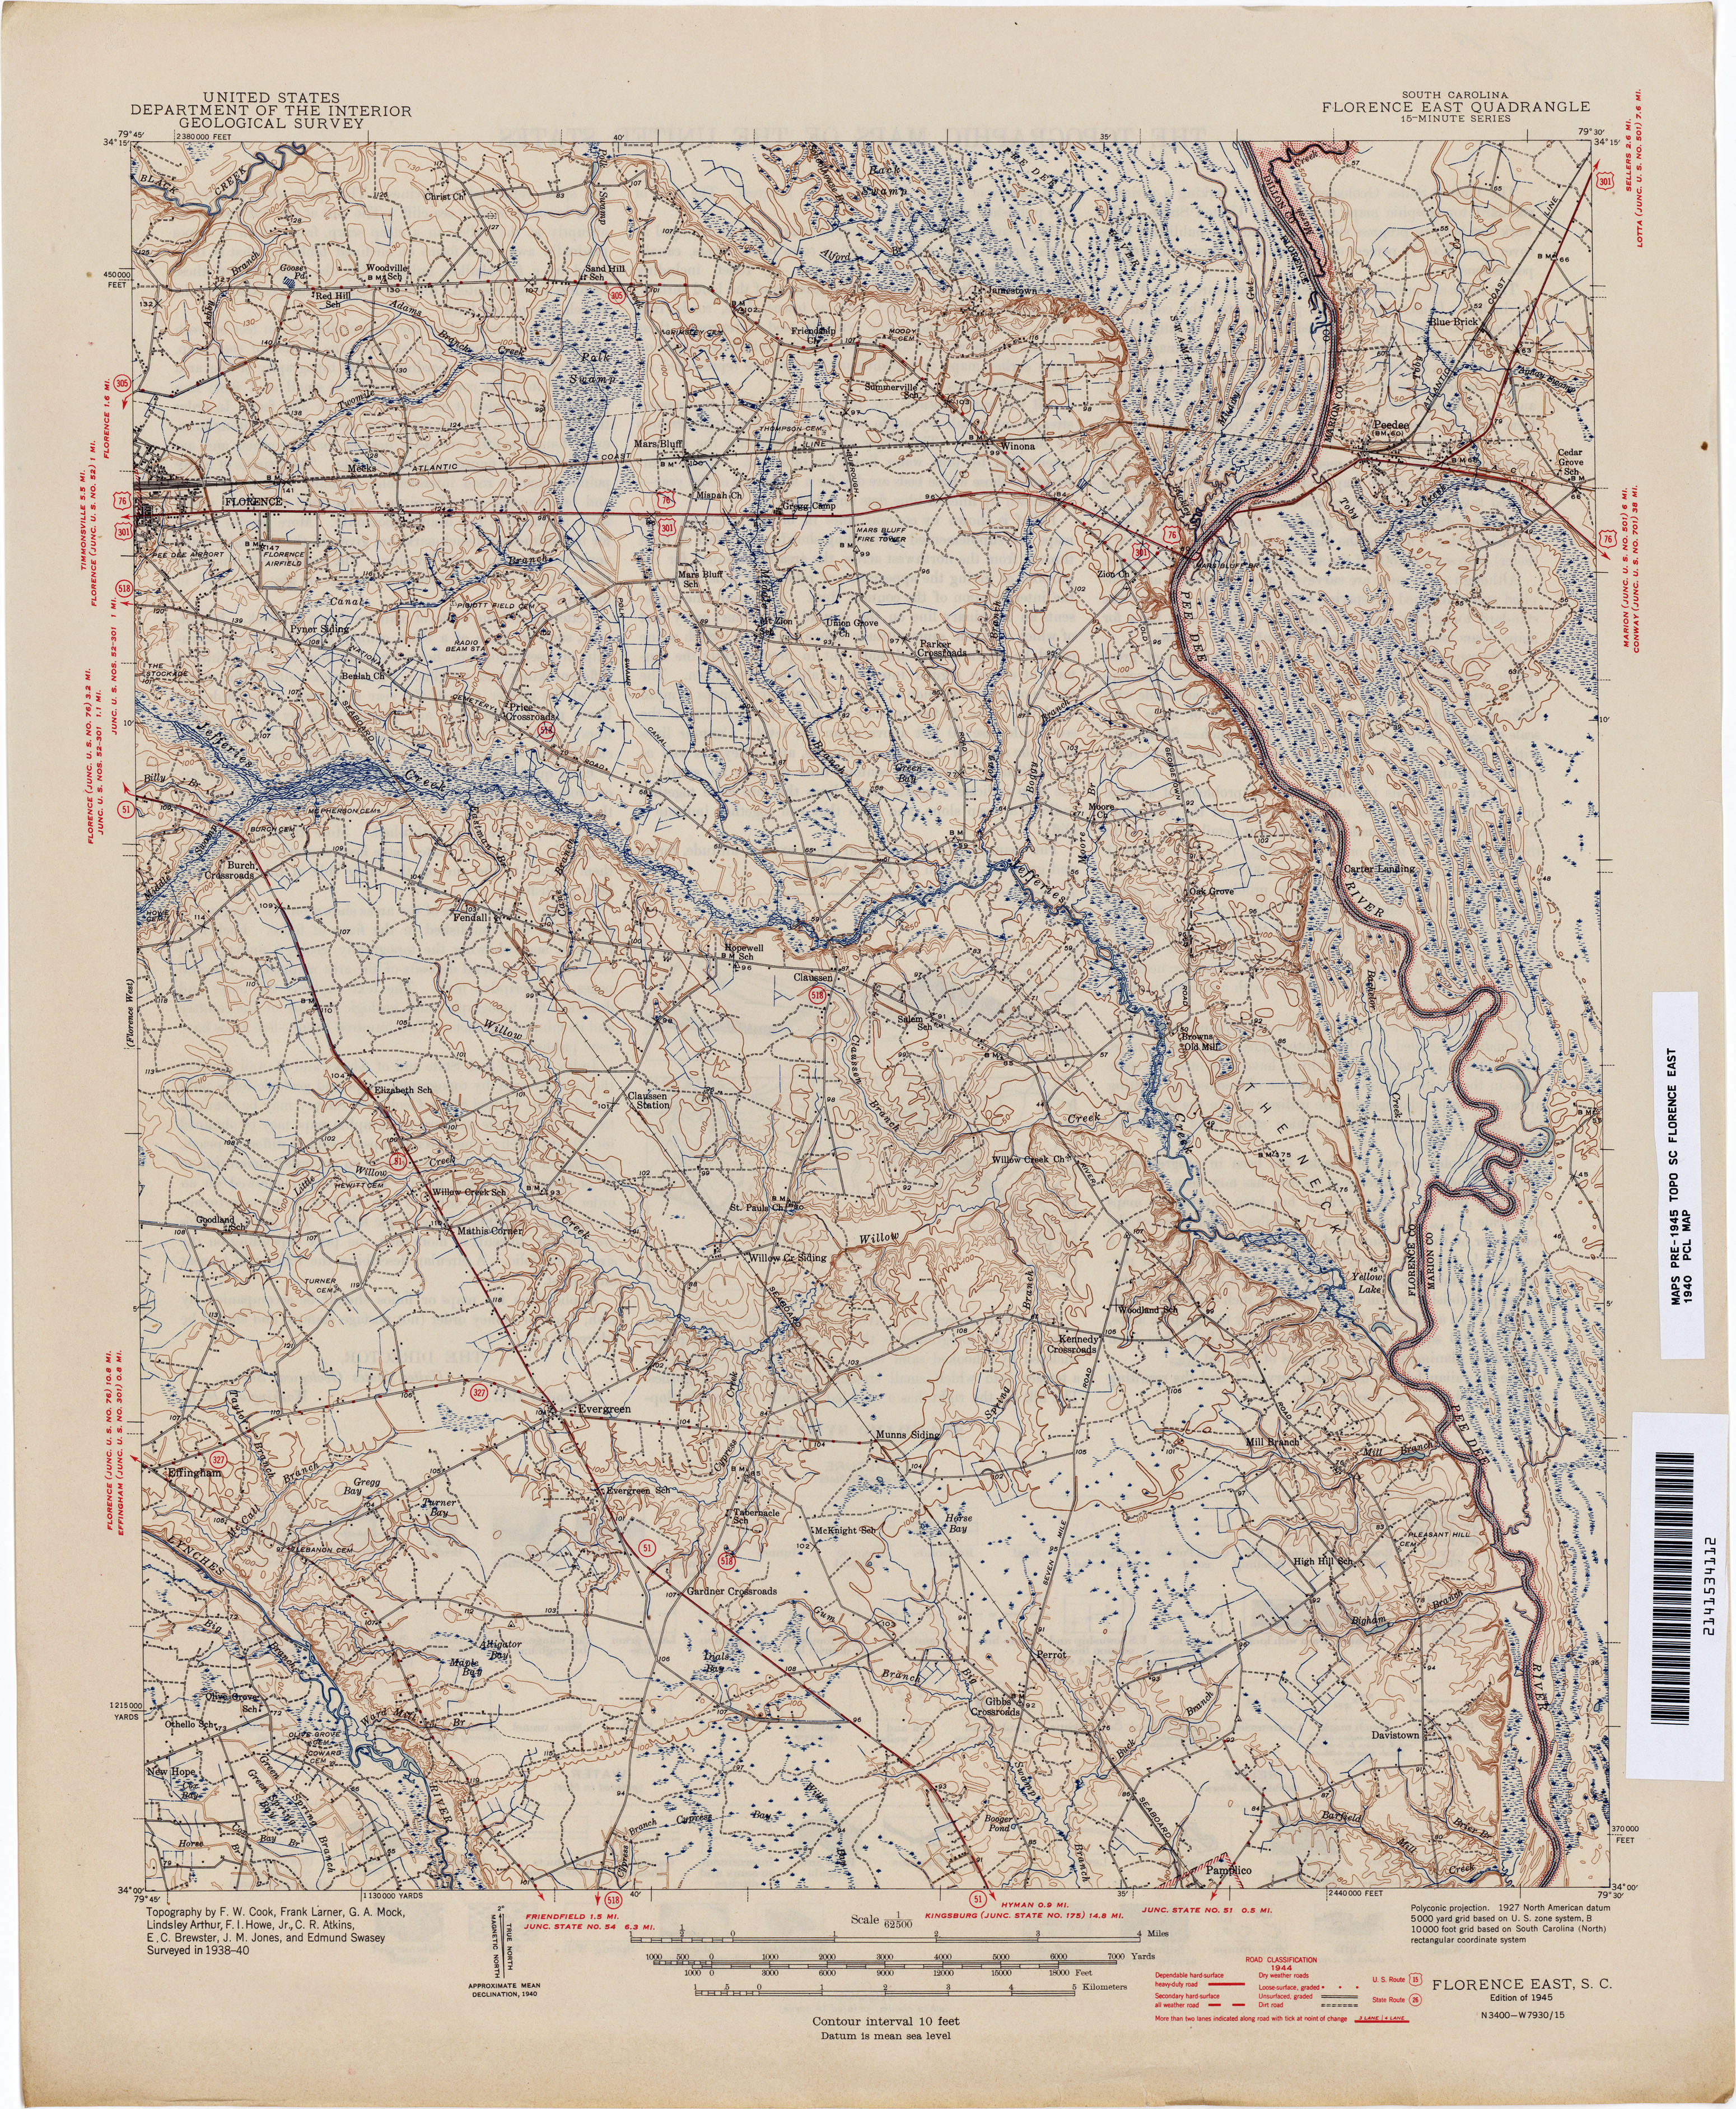 South Carolina Historical Topographic Maps